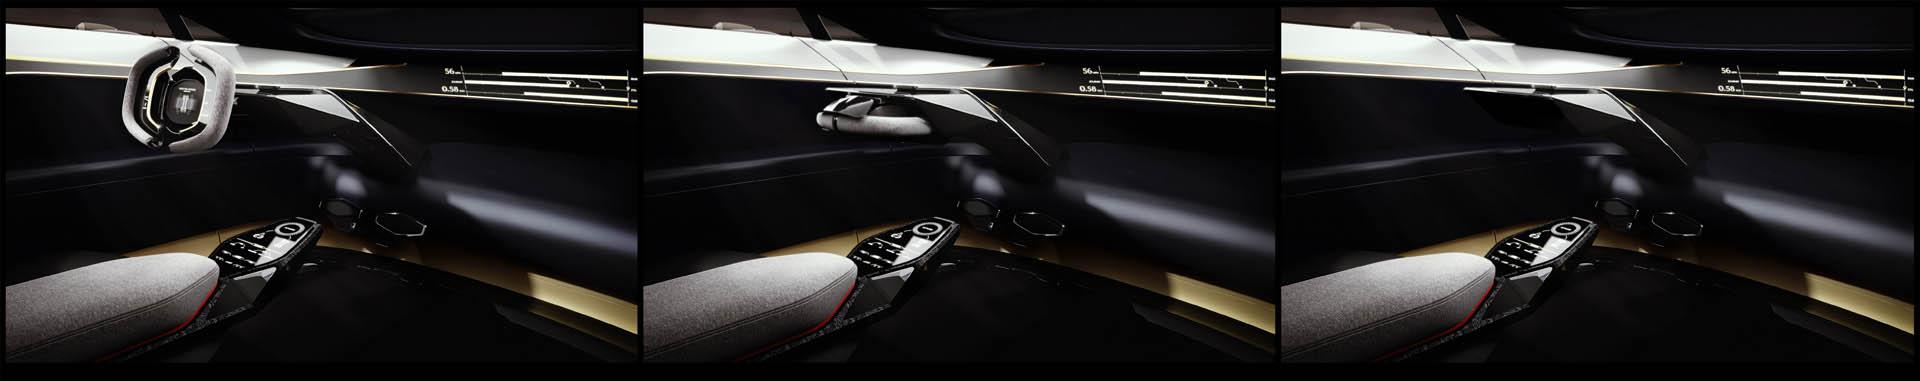 Lagonda-Vision-Concept_Interior_09